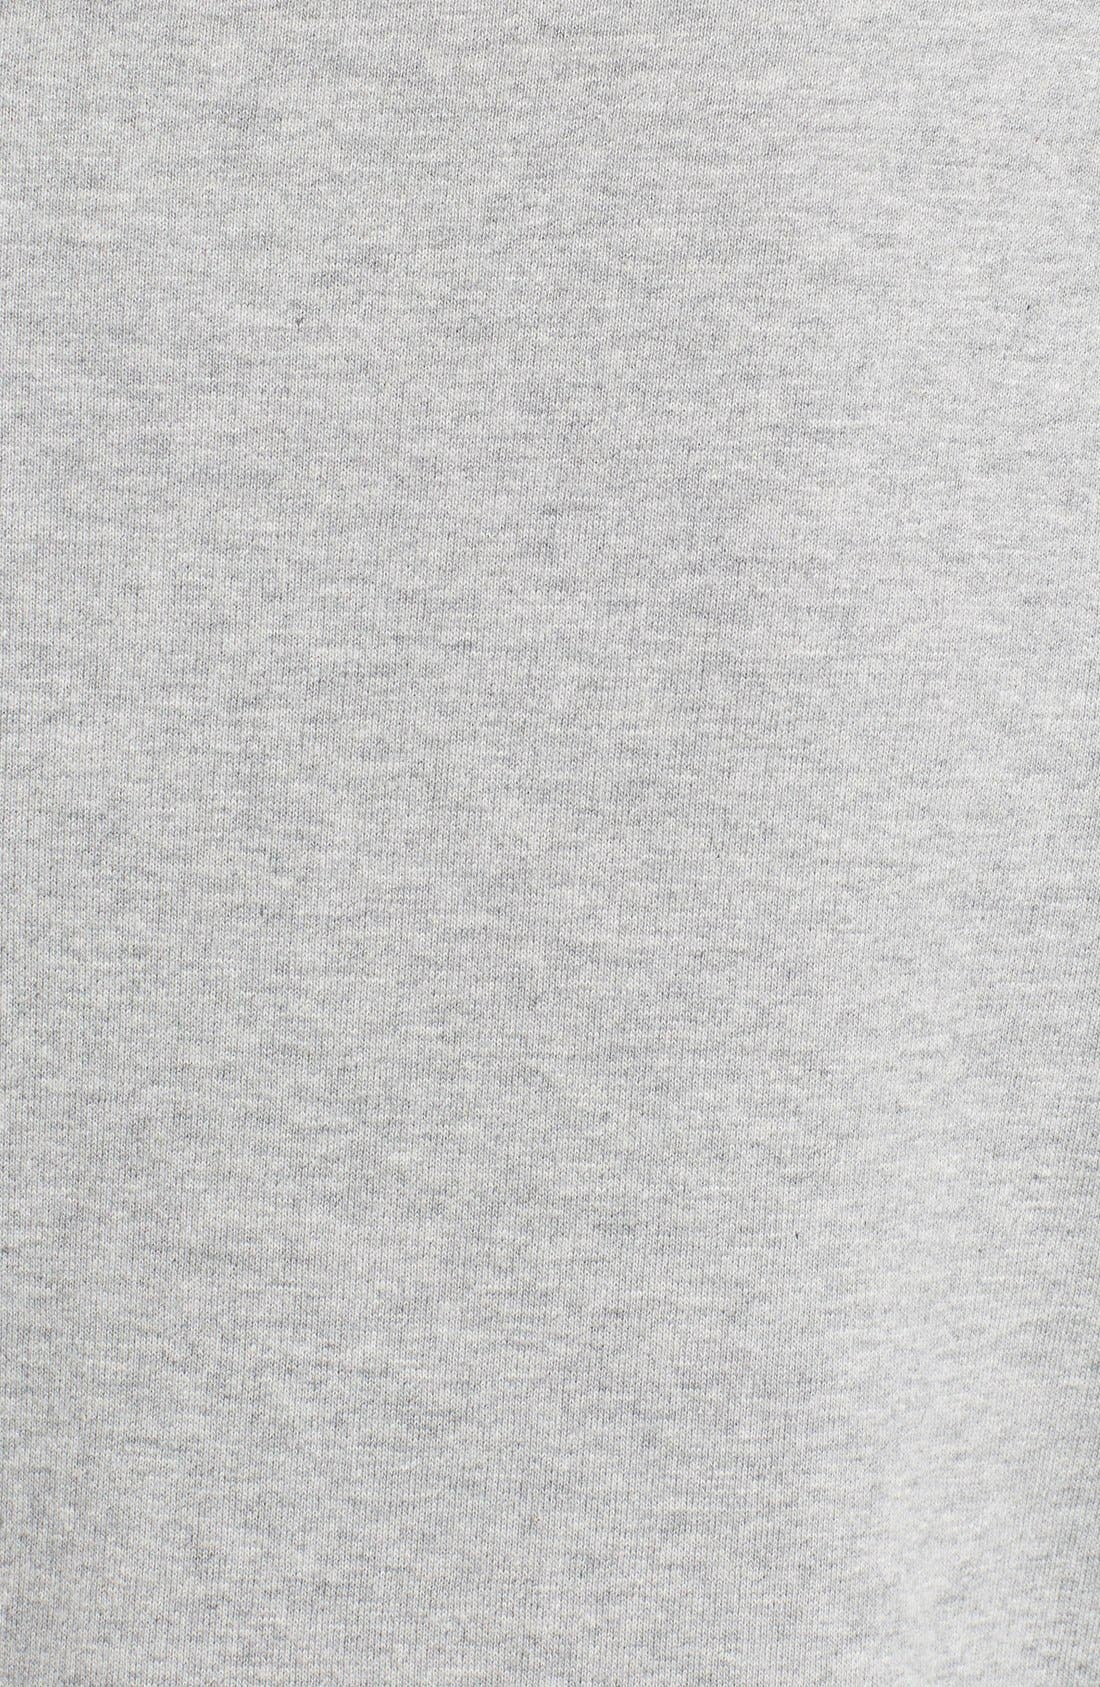 Studded Crewneck Sweatshirt,                             Alternate thumbnail 3, color,                             GREY